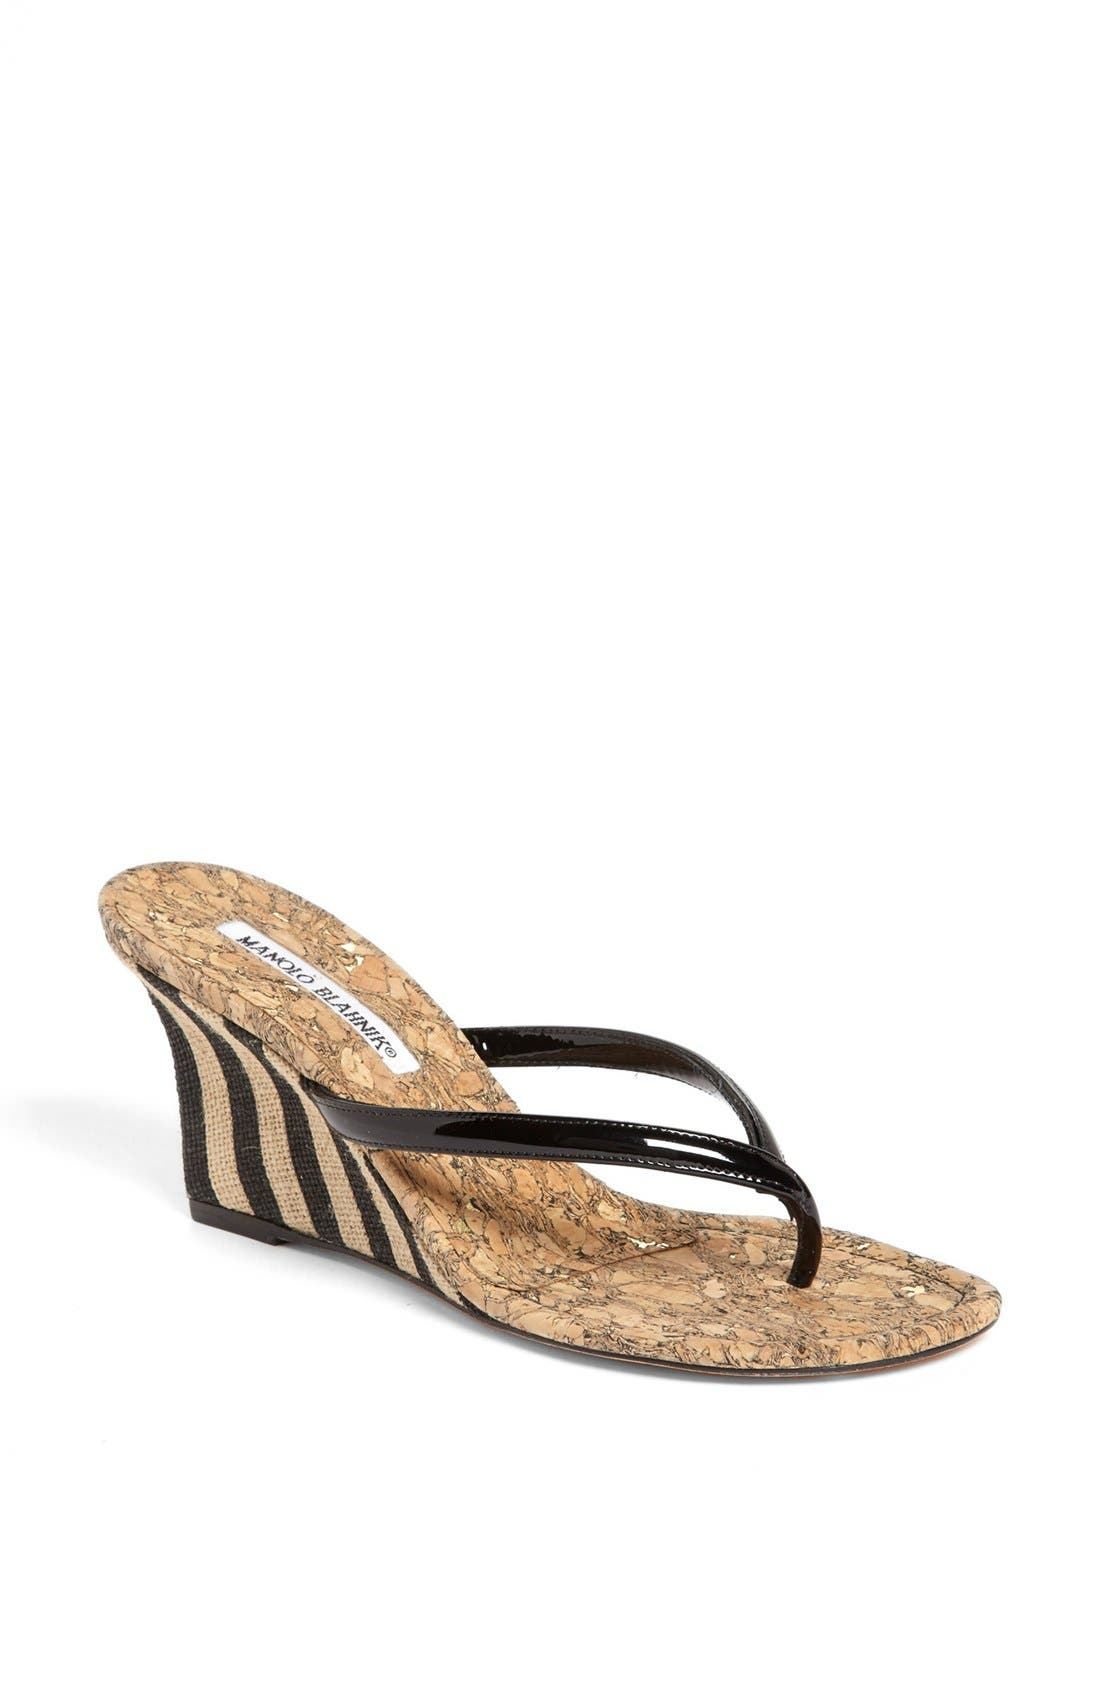 Main Image - Manolo Blahnik 'Pat' Wedge Sandal